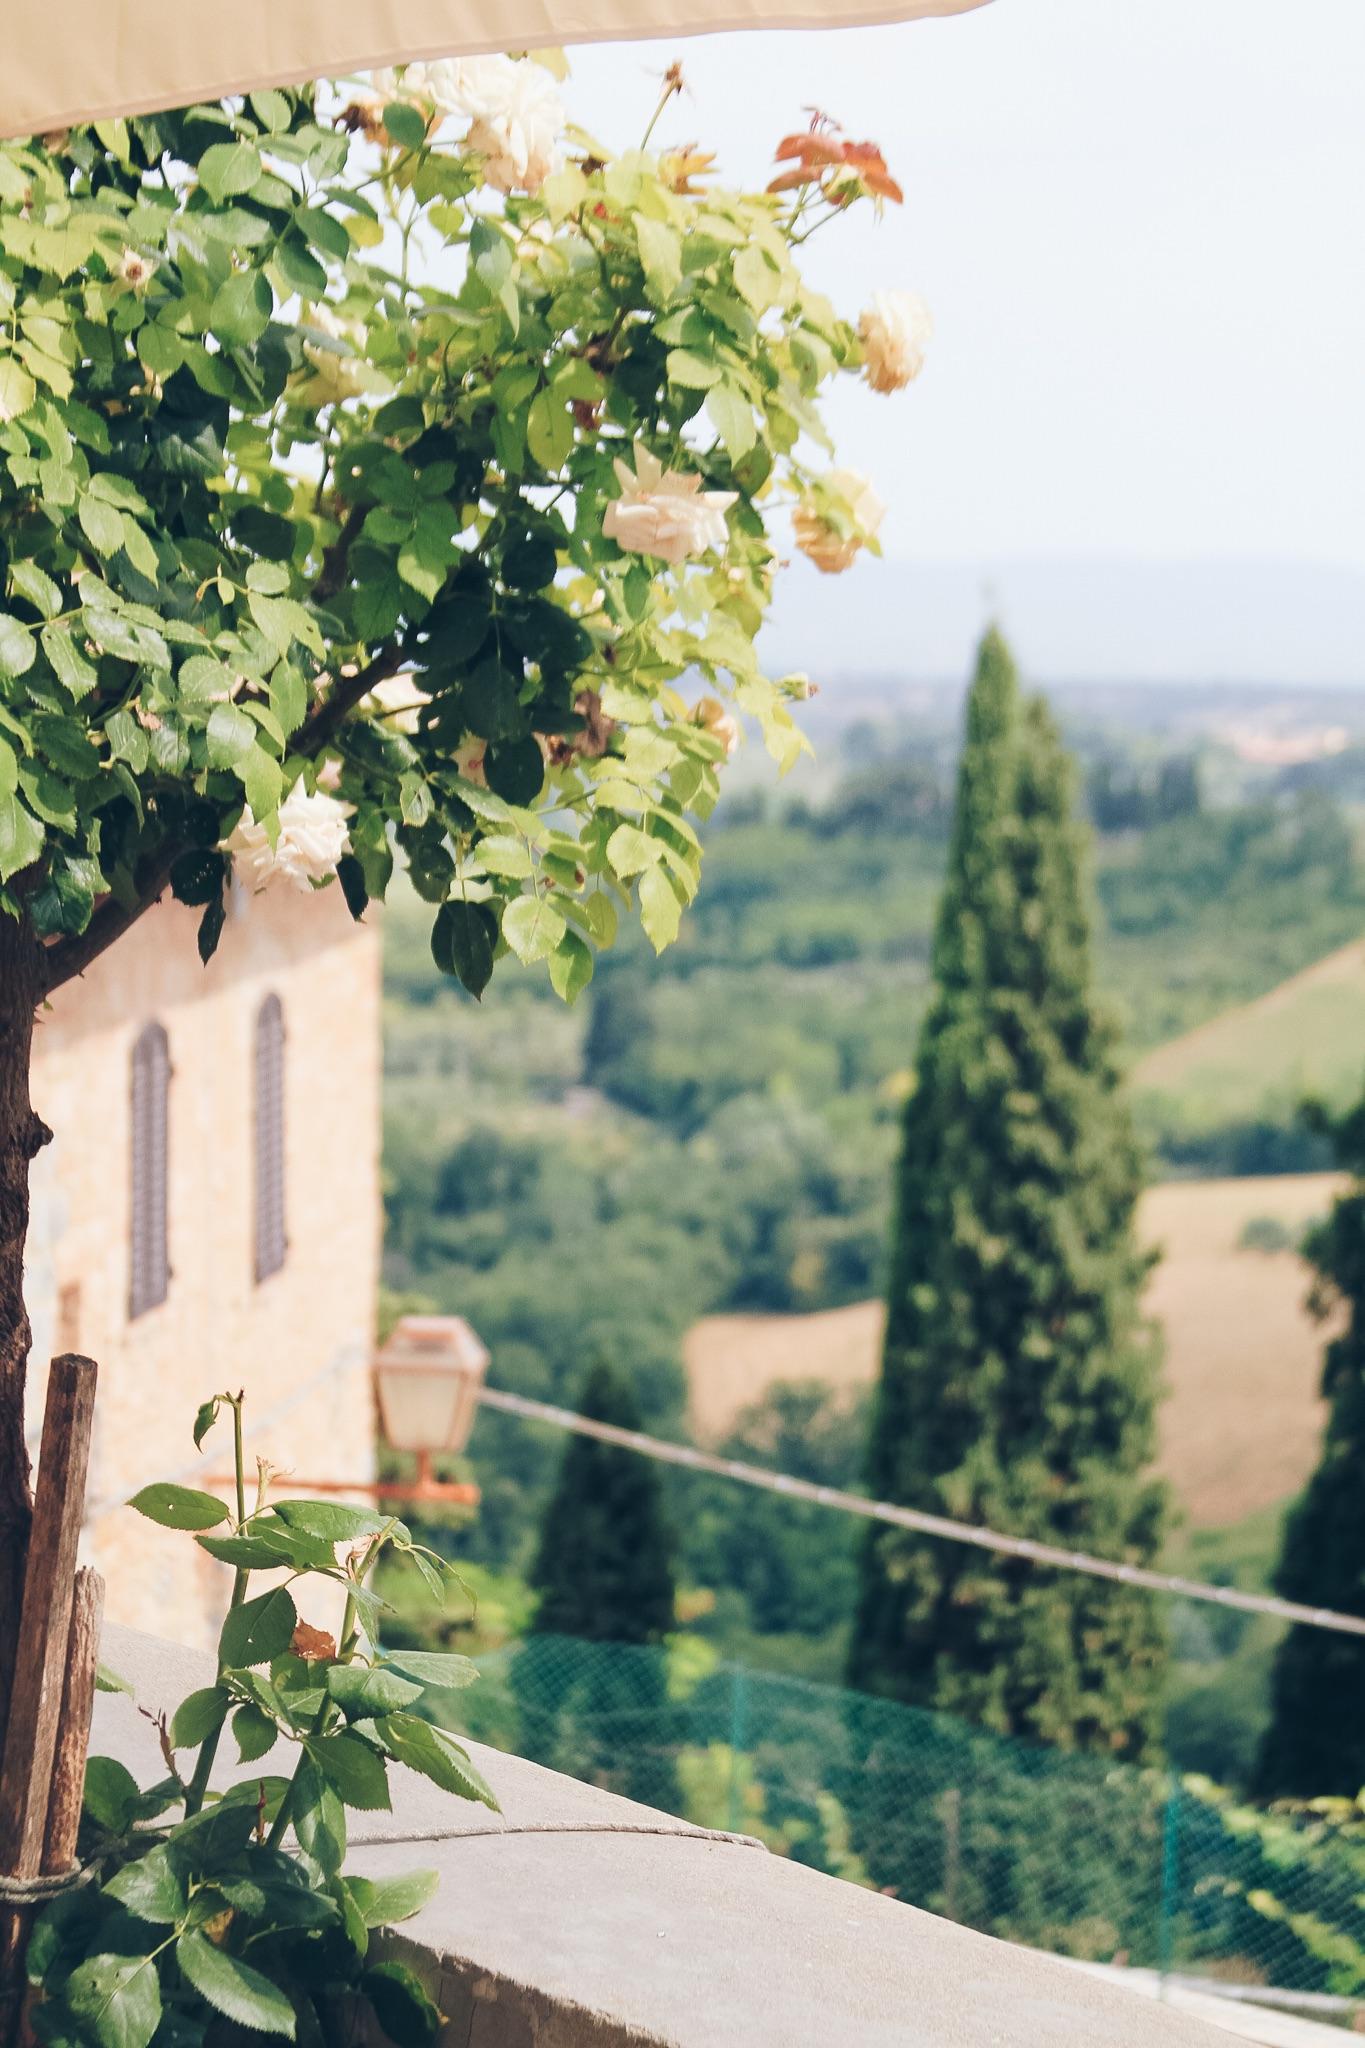 Ten-Days-Florence-Tuscany-Travel-Guide-MonicaFrancis-8